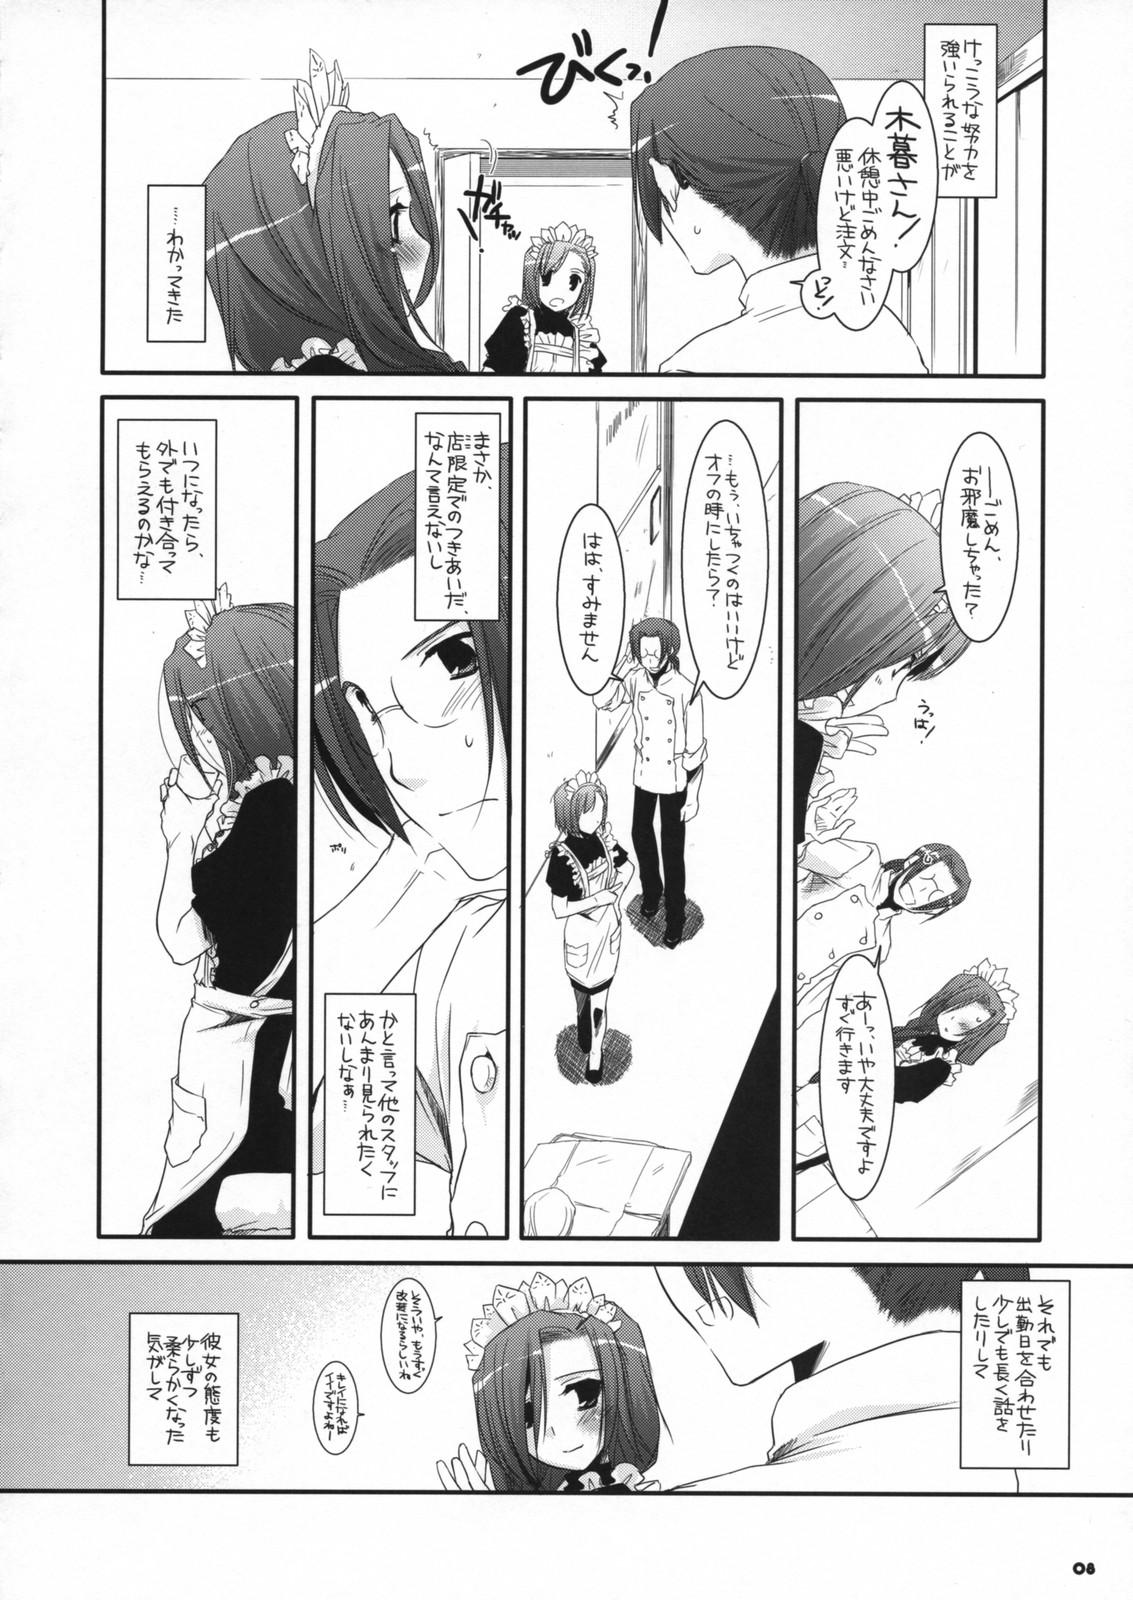 Seifuku Rakuen 21 - Costume Paradise 21 6